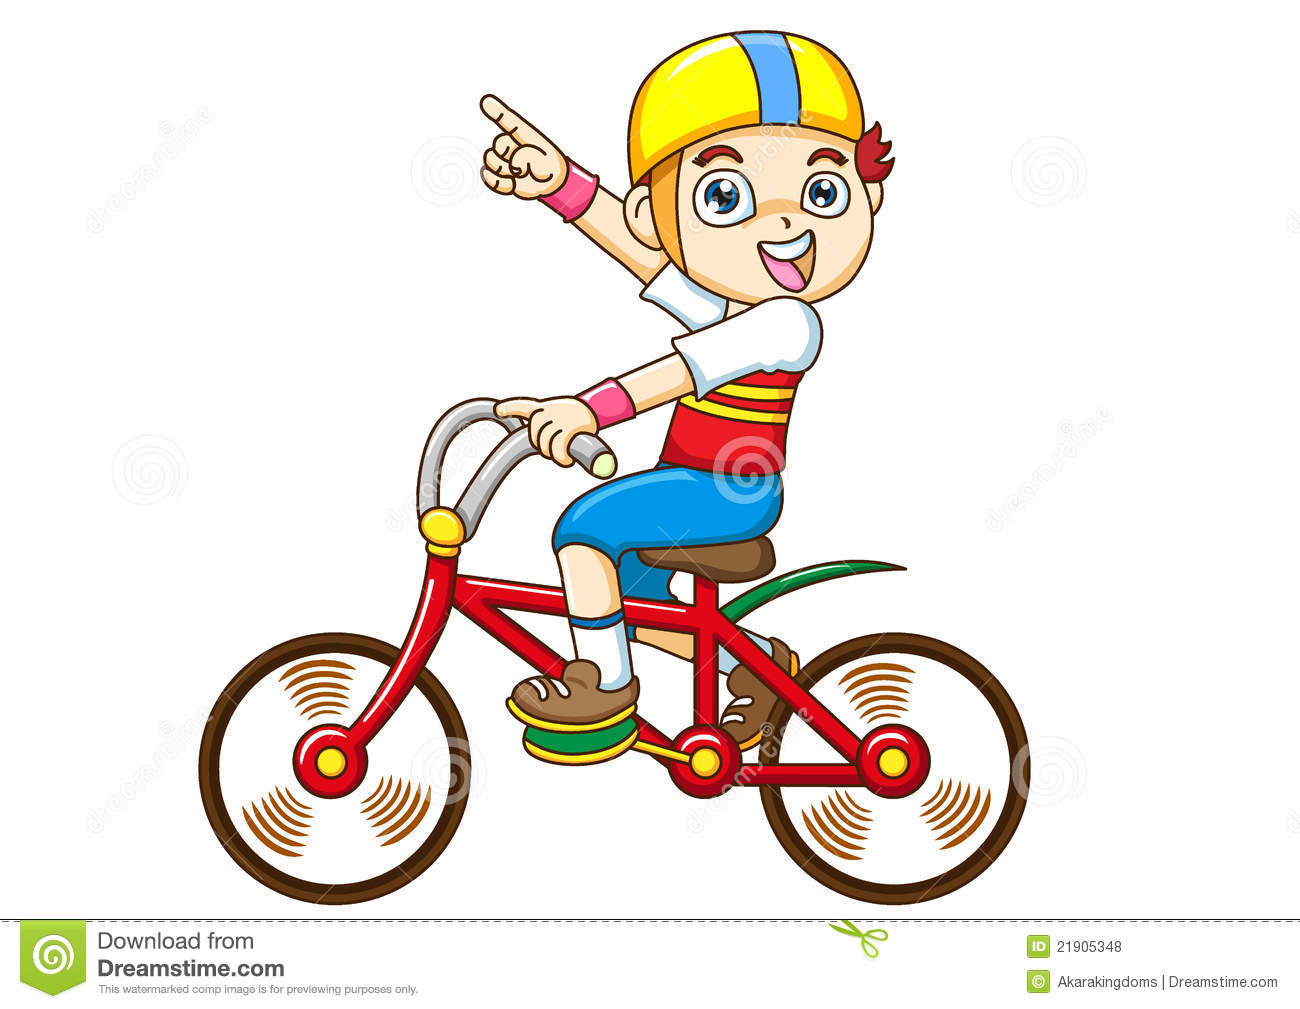 Kids bike clipart svg royalty free Kids Riding Bikes Clipart | Clipart Panda - Free Clipart Images svg royalty free